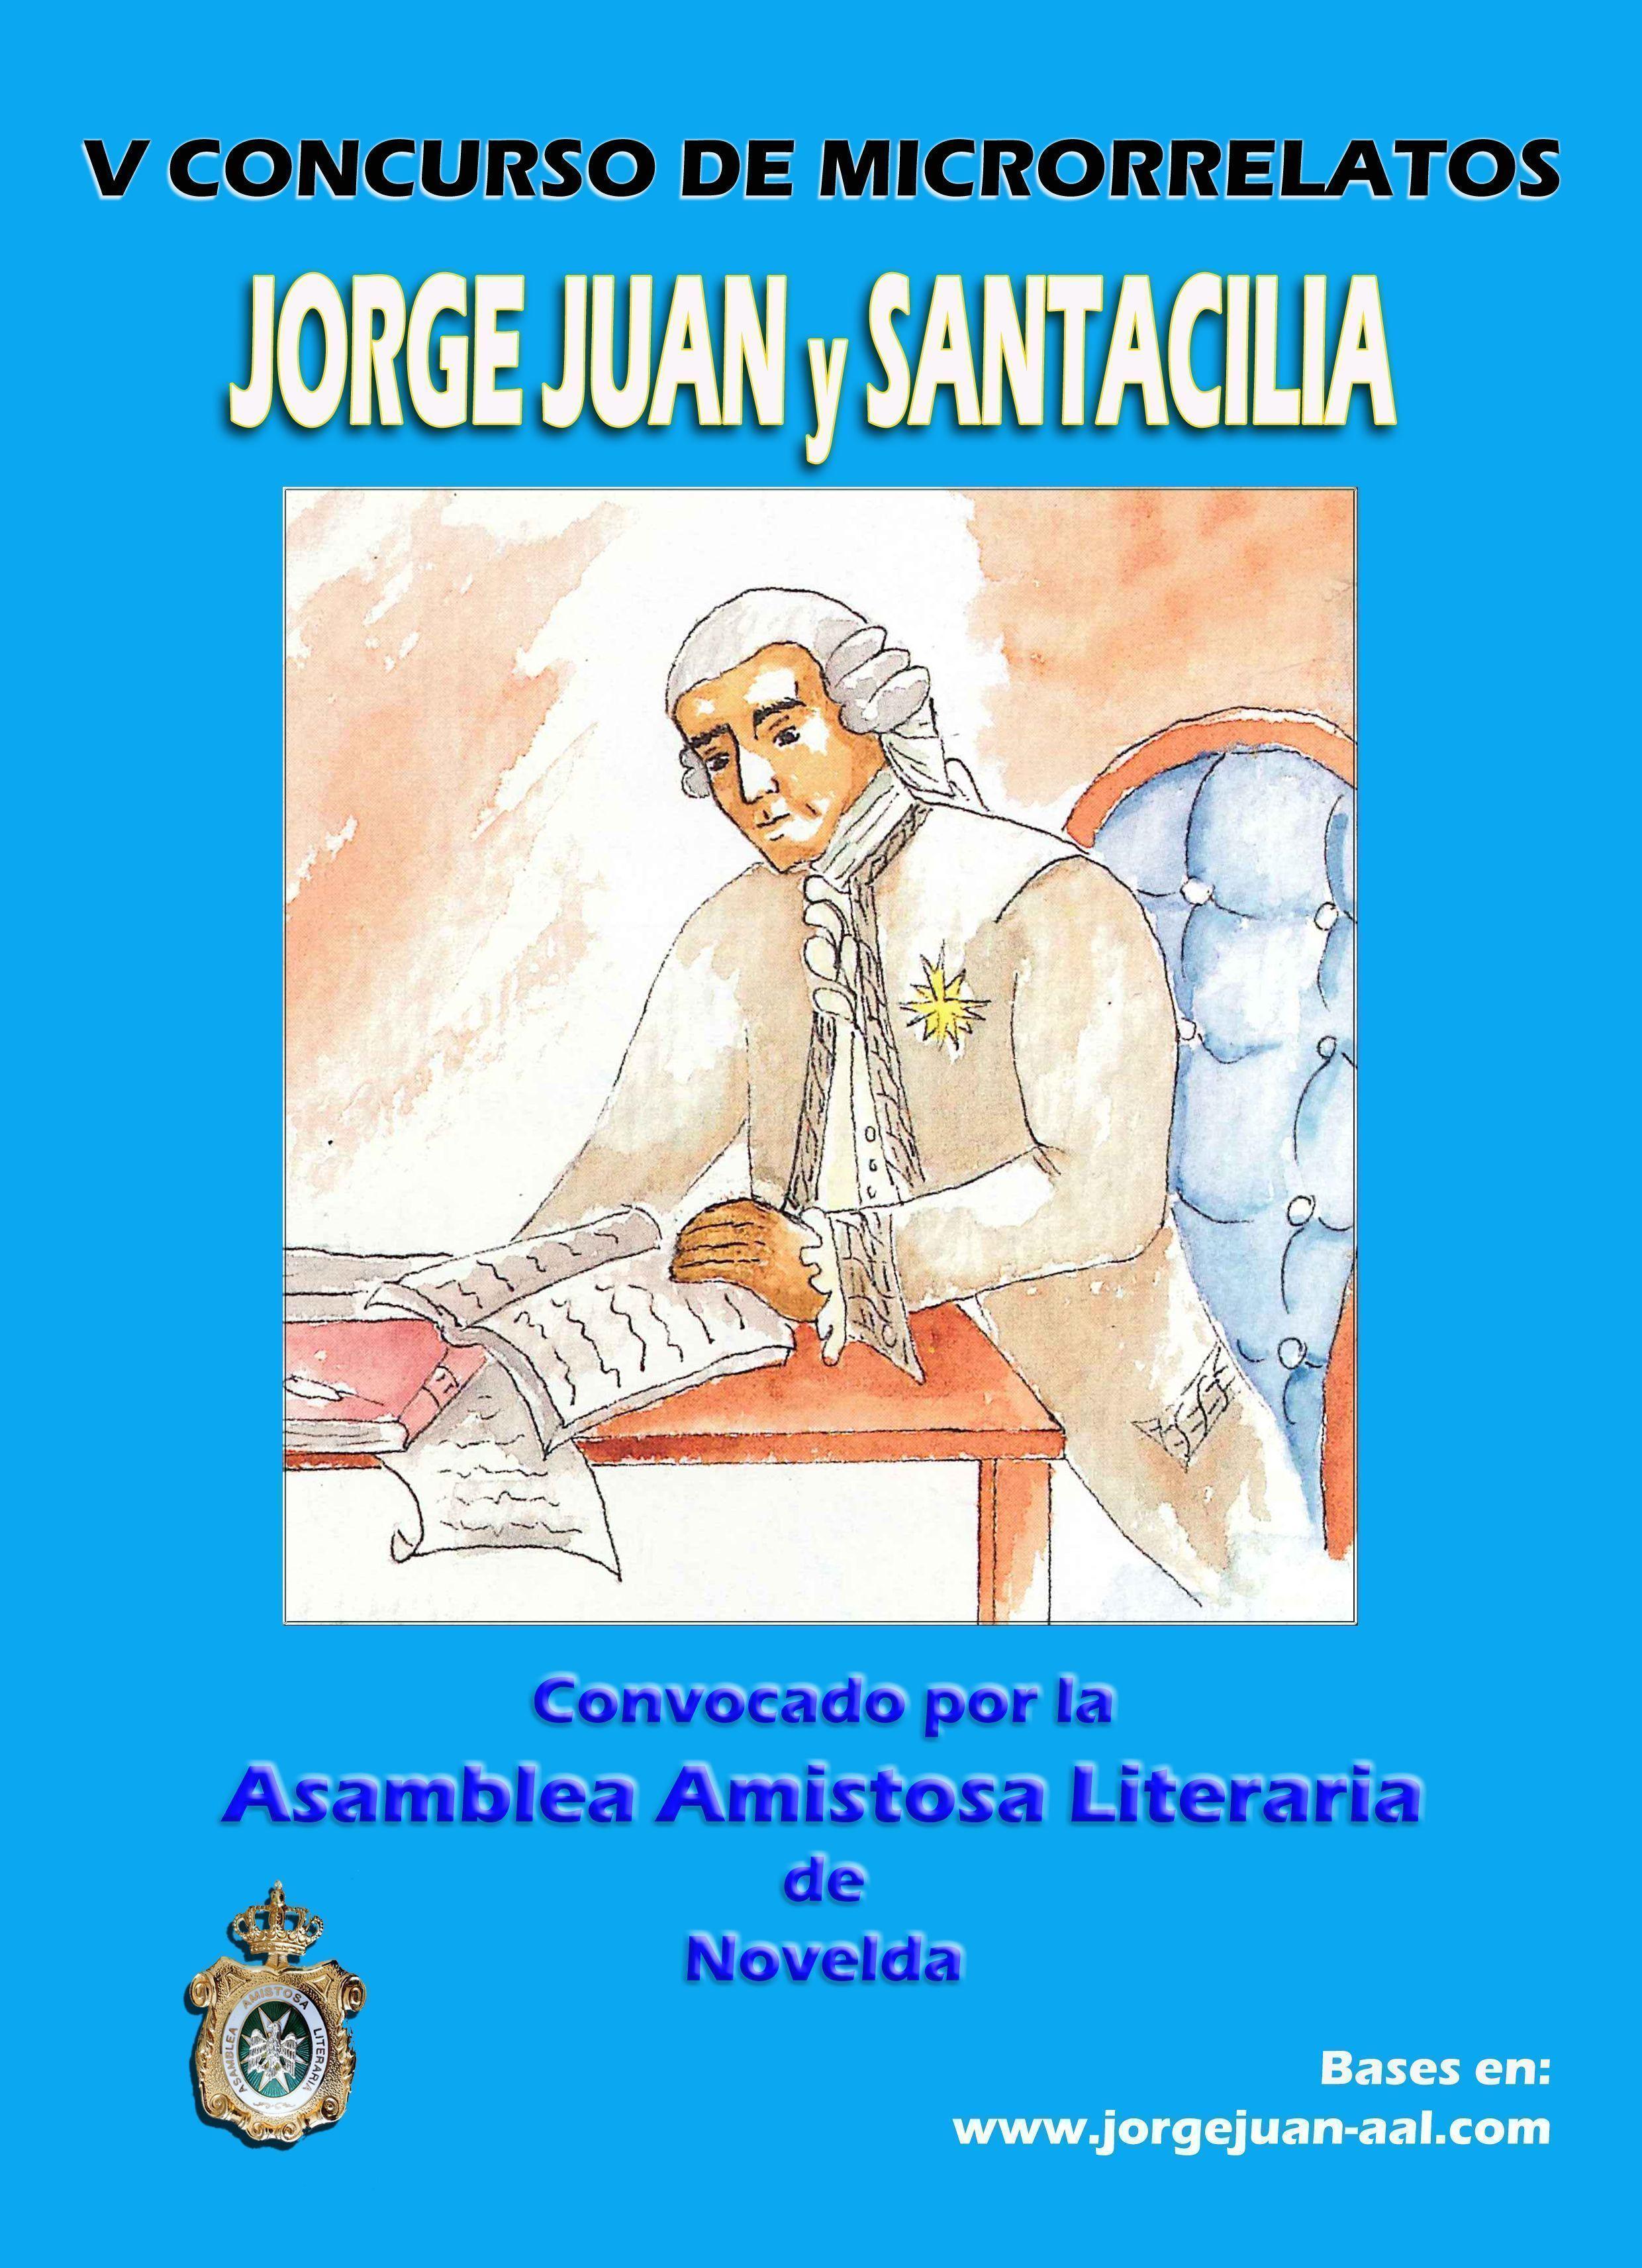 "V CERTAMEN INTERNACIONAL DE MICRORRELATOS  ""JORGE JUAN y SANTACILIA"" 2018"